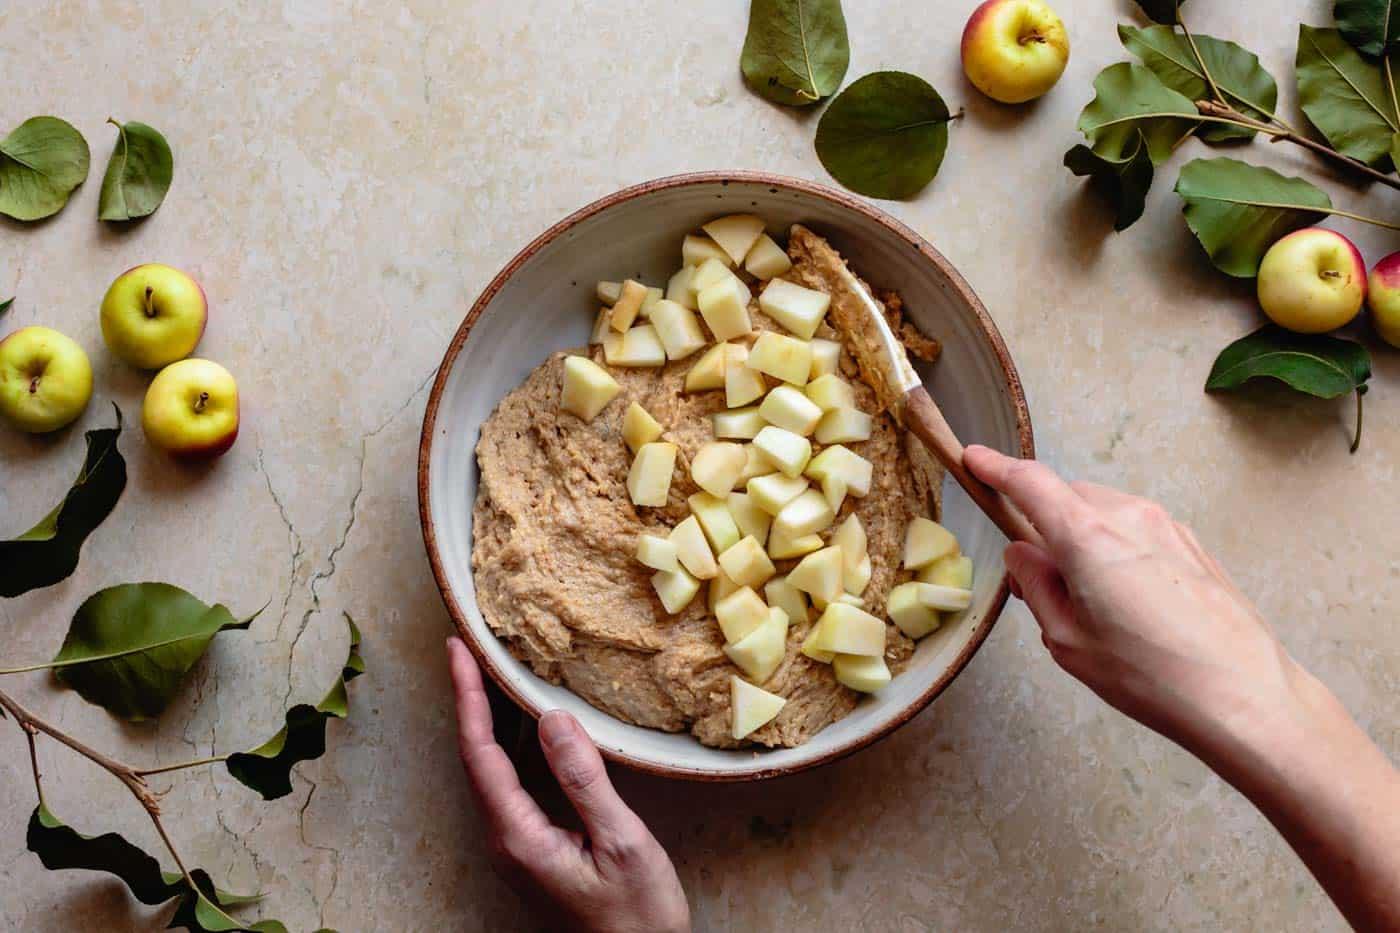 Adding apples to batter for gluten-free apple cake recipe